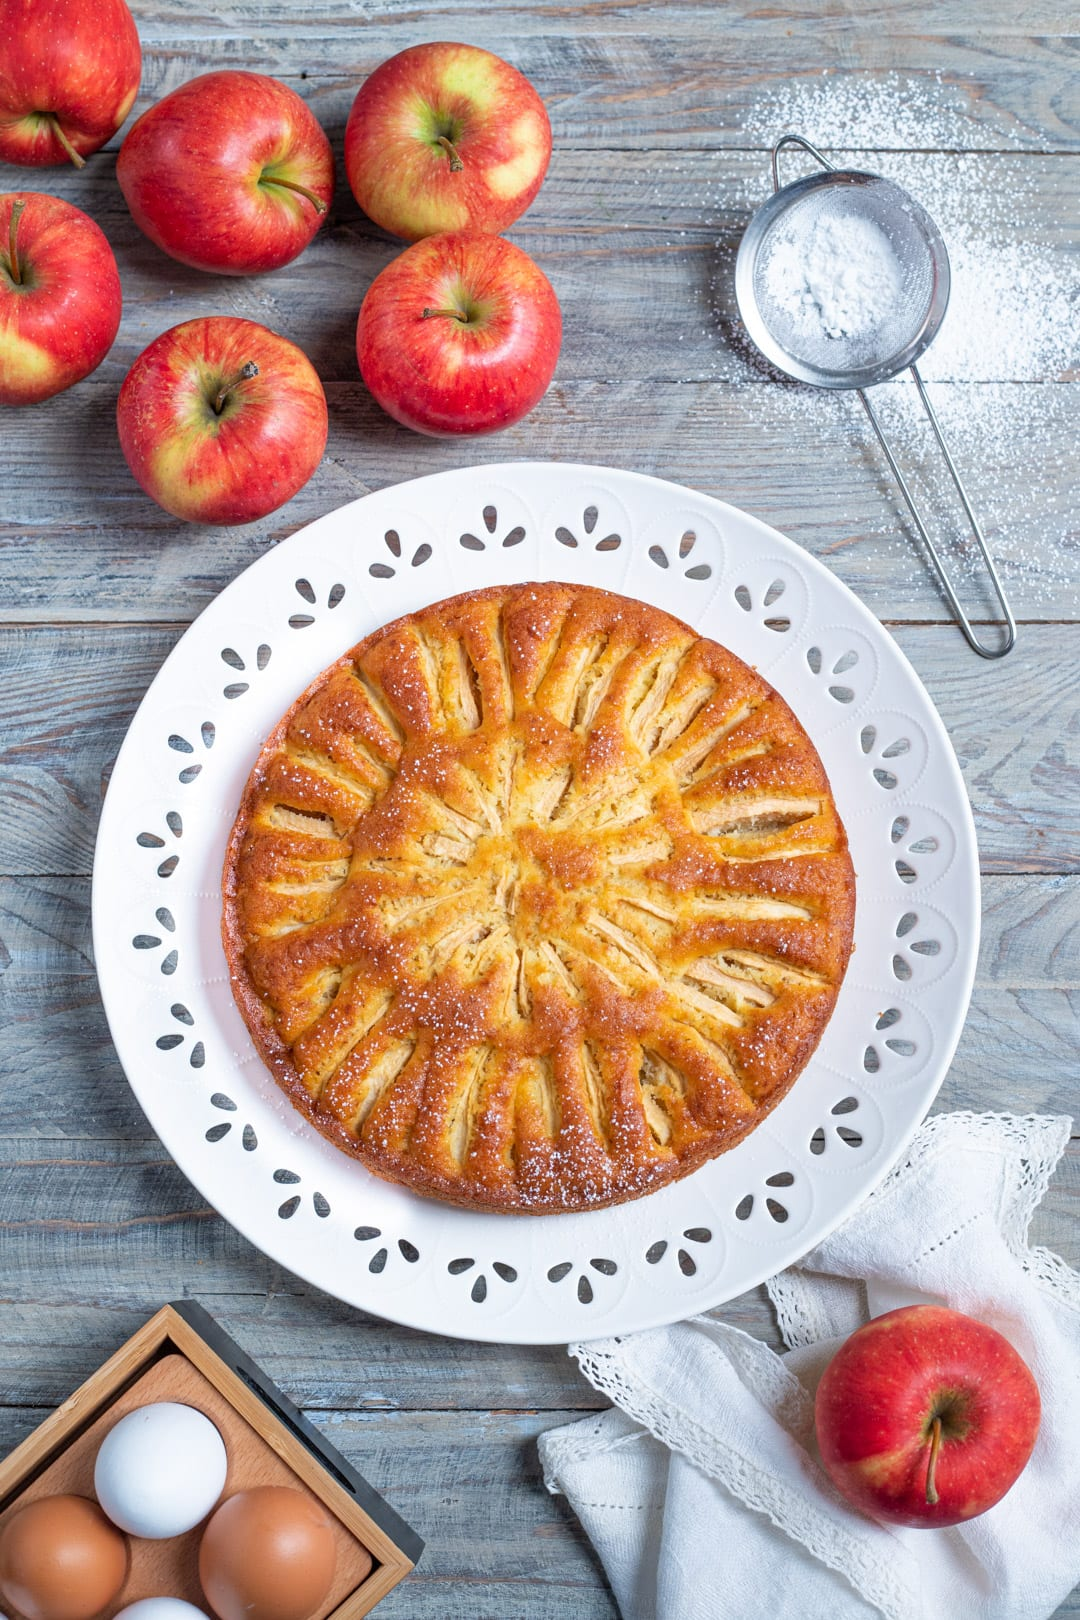 Torta di mele nel piatto: ricetta torta di mele veloce